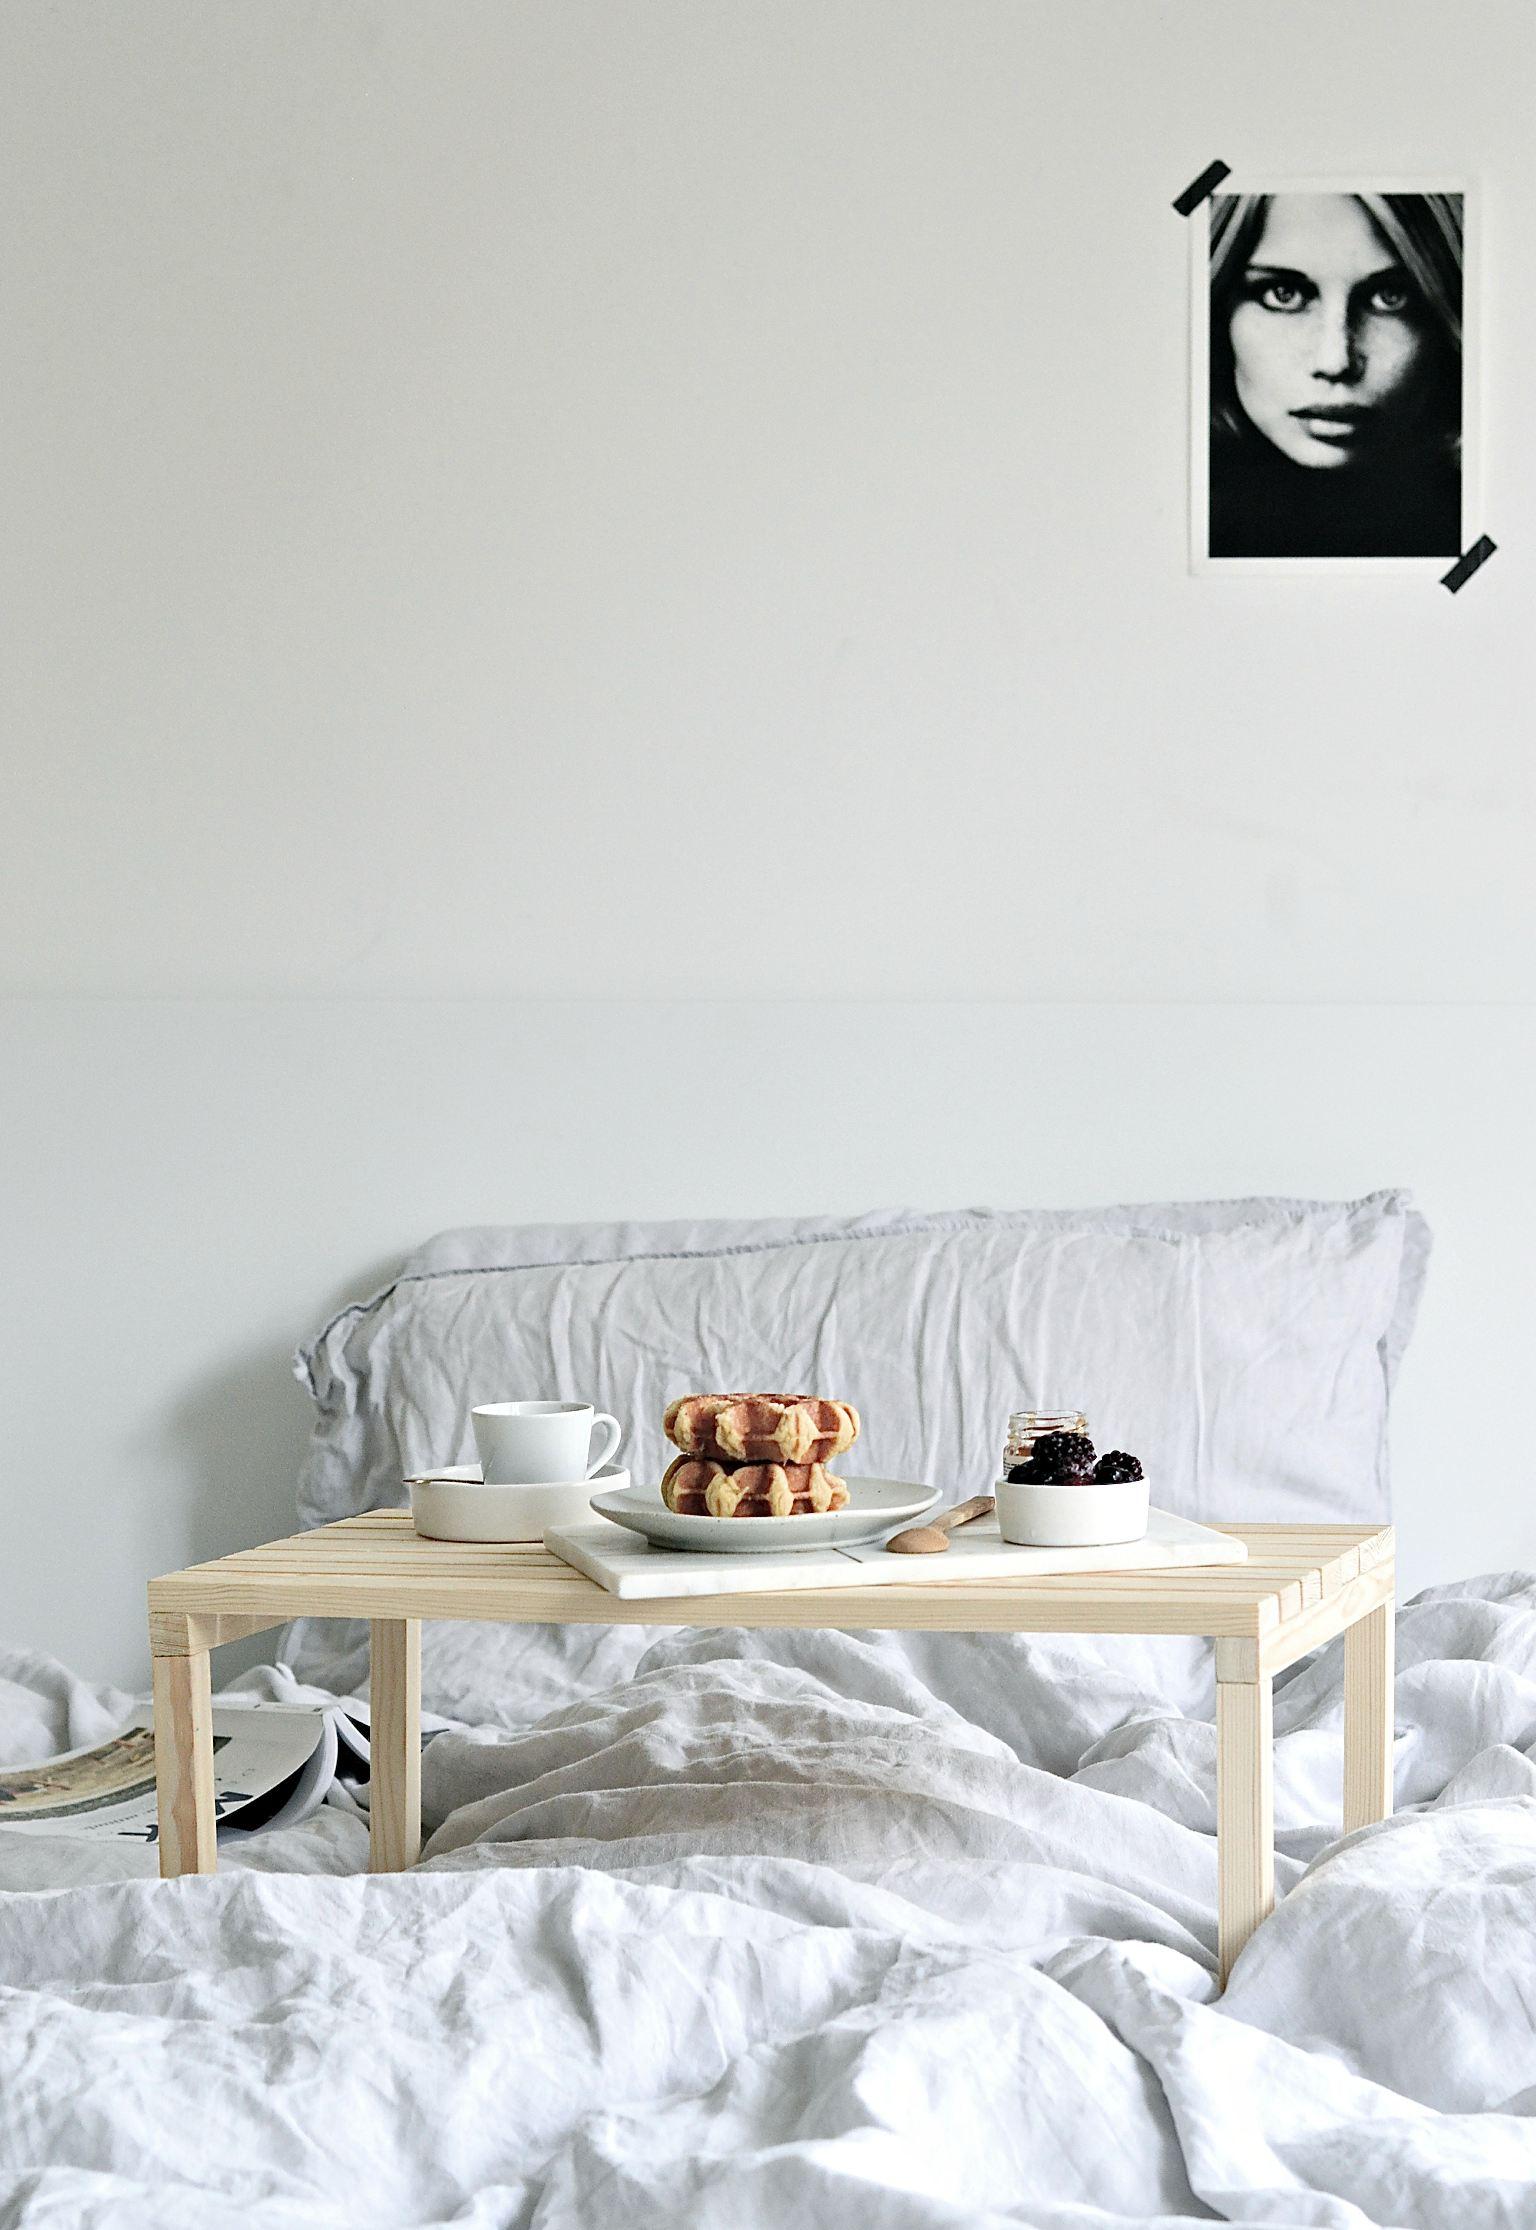 Diy Breakfast In Bed Table